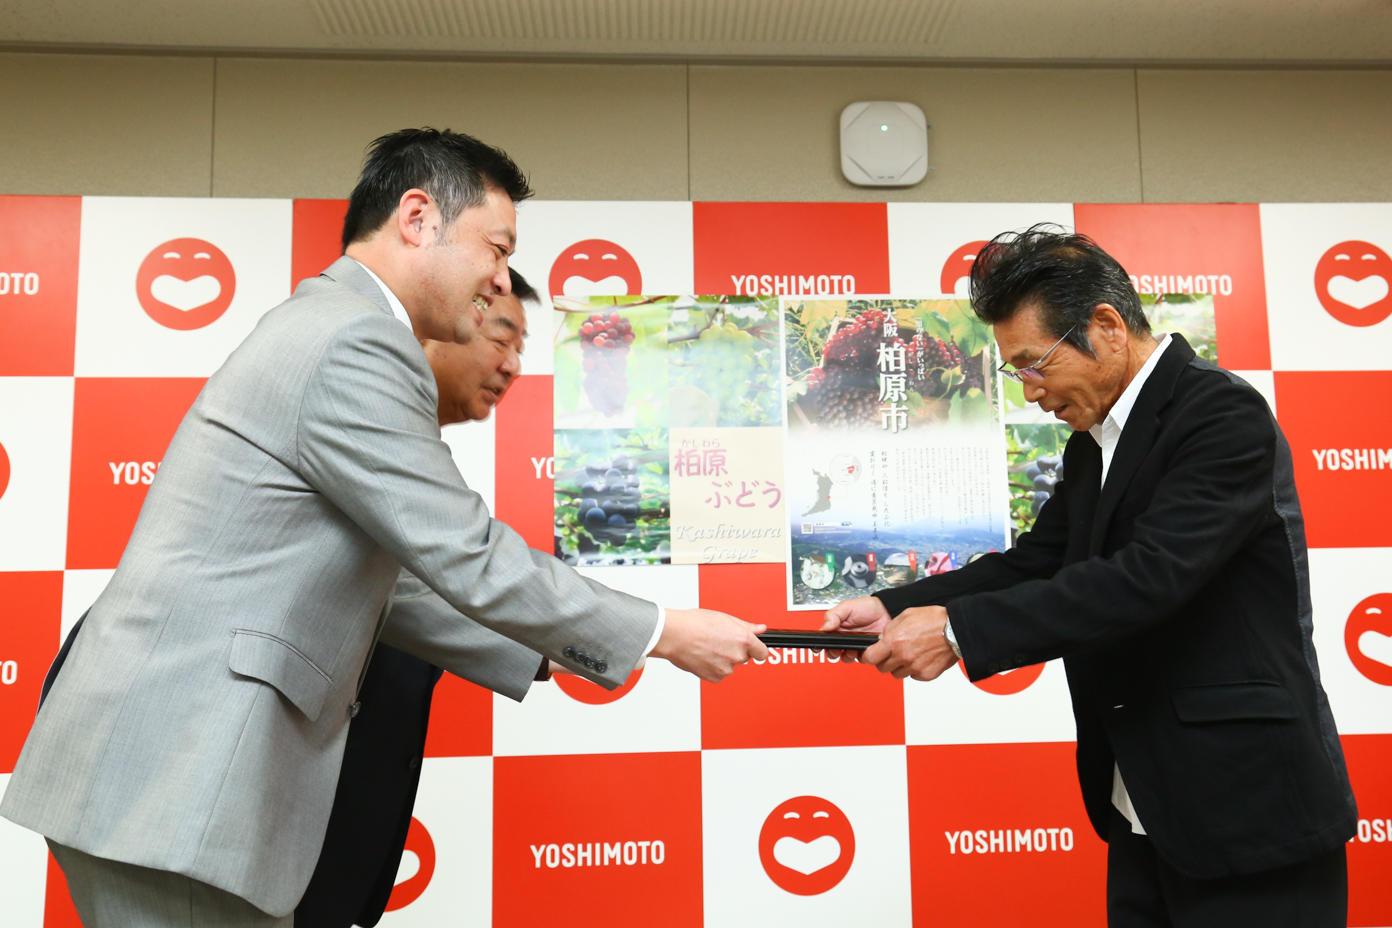 http://news.yoshimoto.co.jp/20171130212928-27525d311dbf900c02094eb1ef24930a8e88d589.jpg